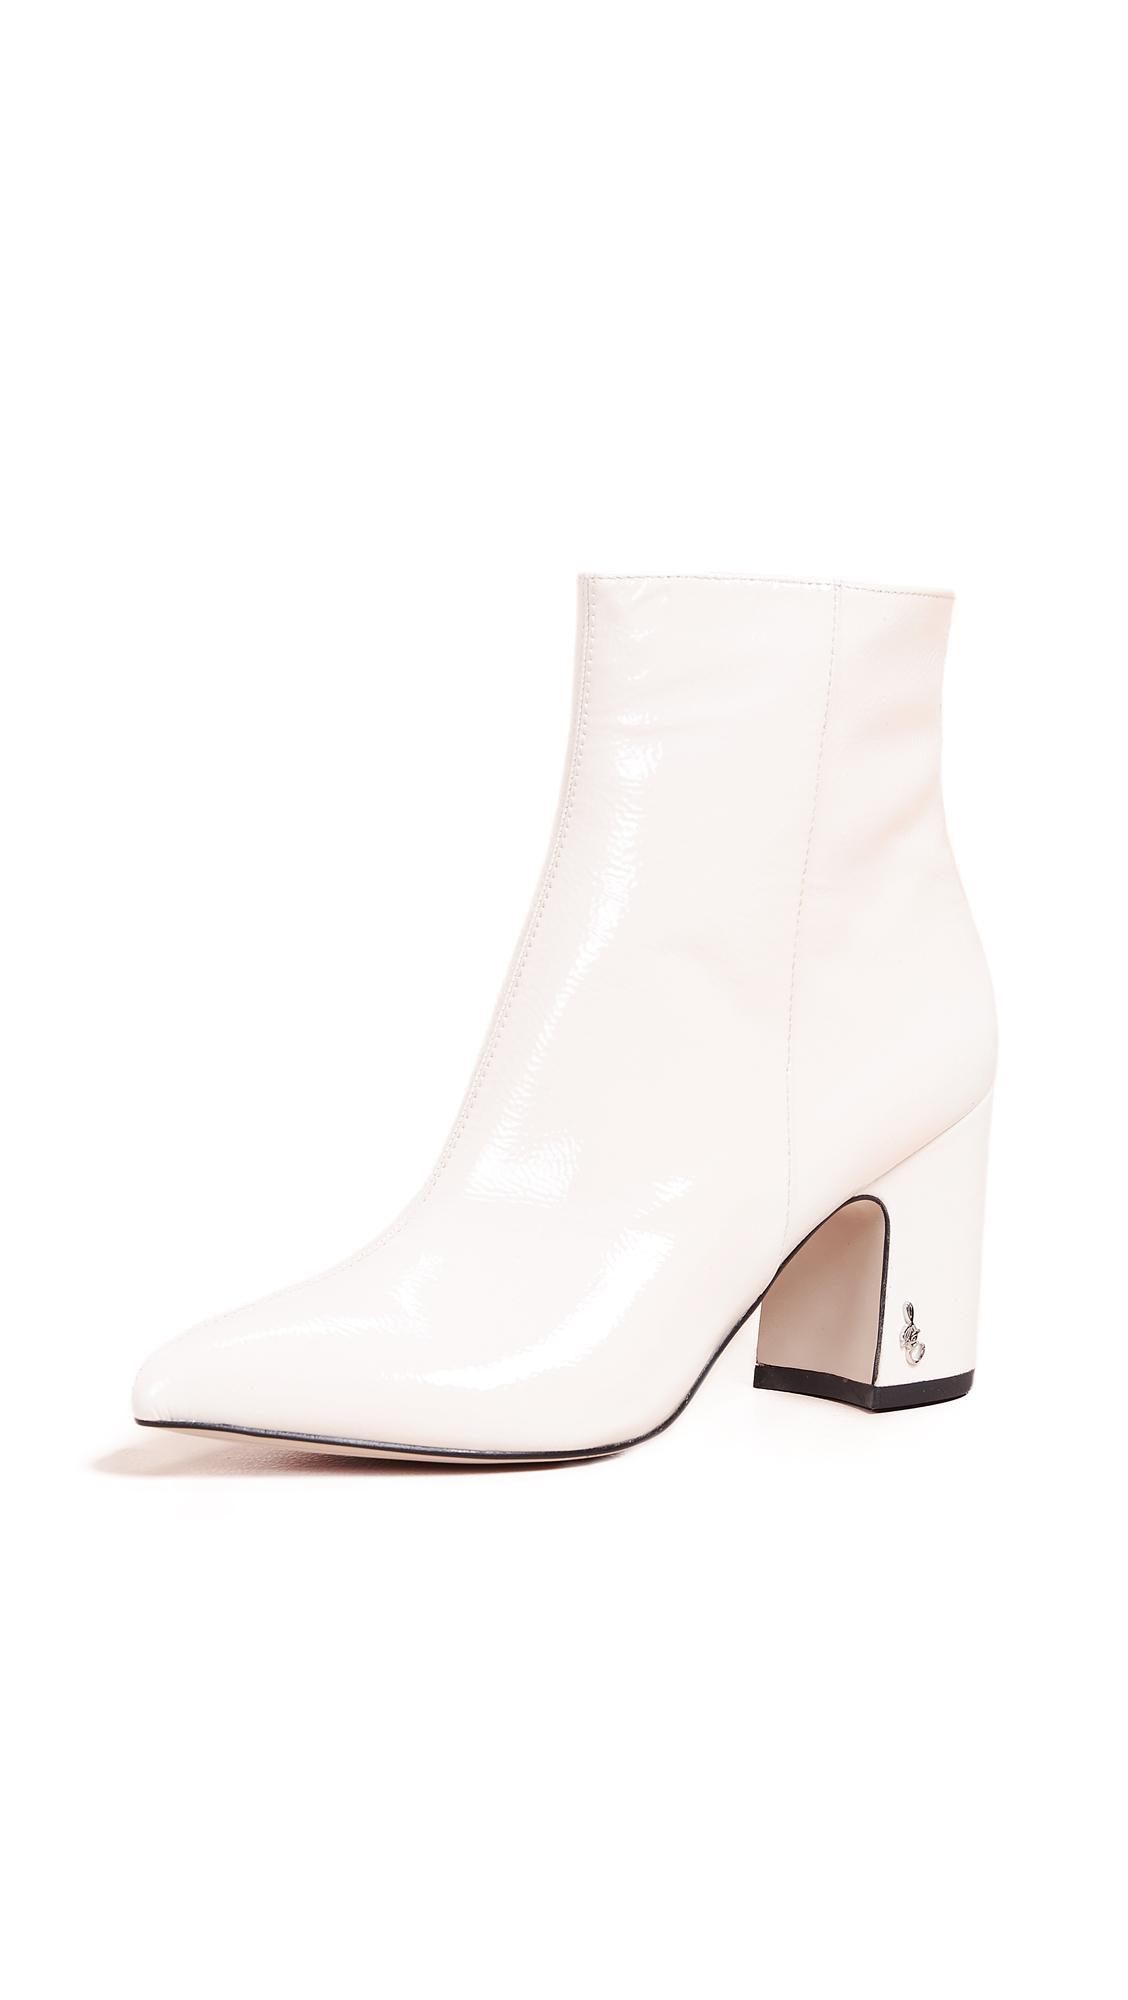 18fa65d49 Sam Edelman Hilty Booties In Bright White